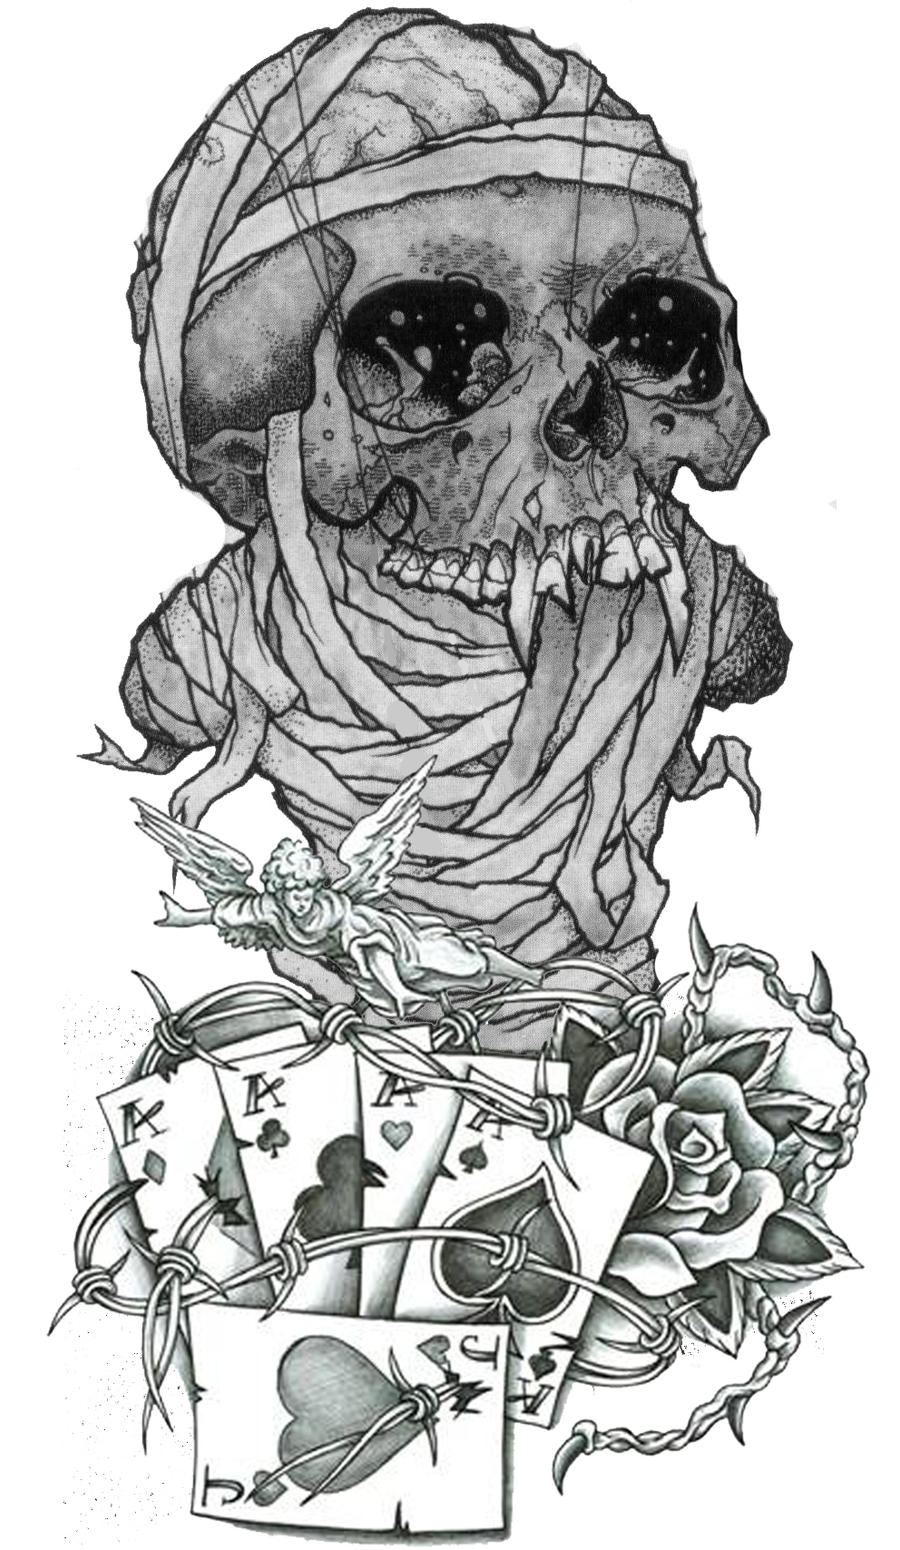 pushead skull tattoo design by guitar master 101 on deviantart. Black Bedroom Furniture Sets. Home Design Ideas